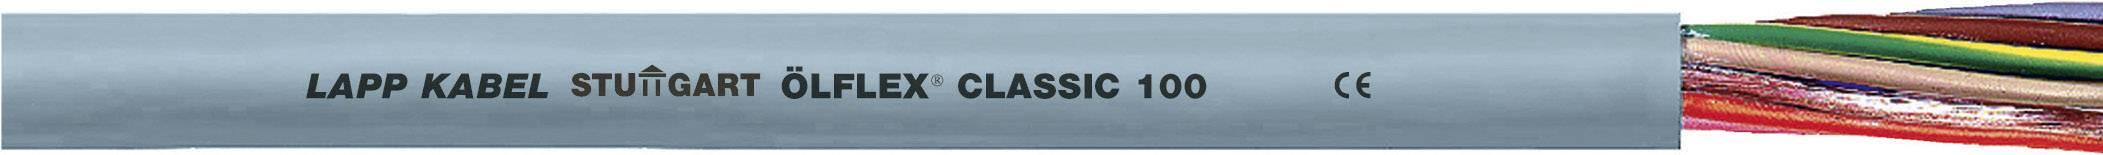 Kabel LappKabel Ölflex CLASSIC 100 10G0,5 (0010007), PVC, 8,6 mm, 500 V, šedá, 1000 m